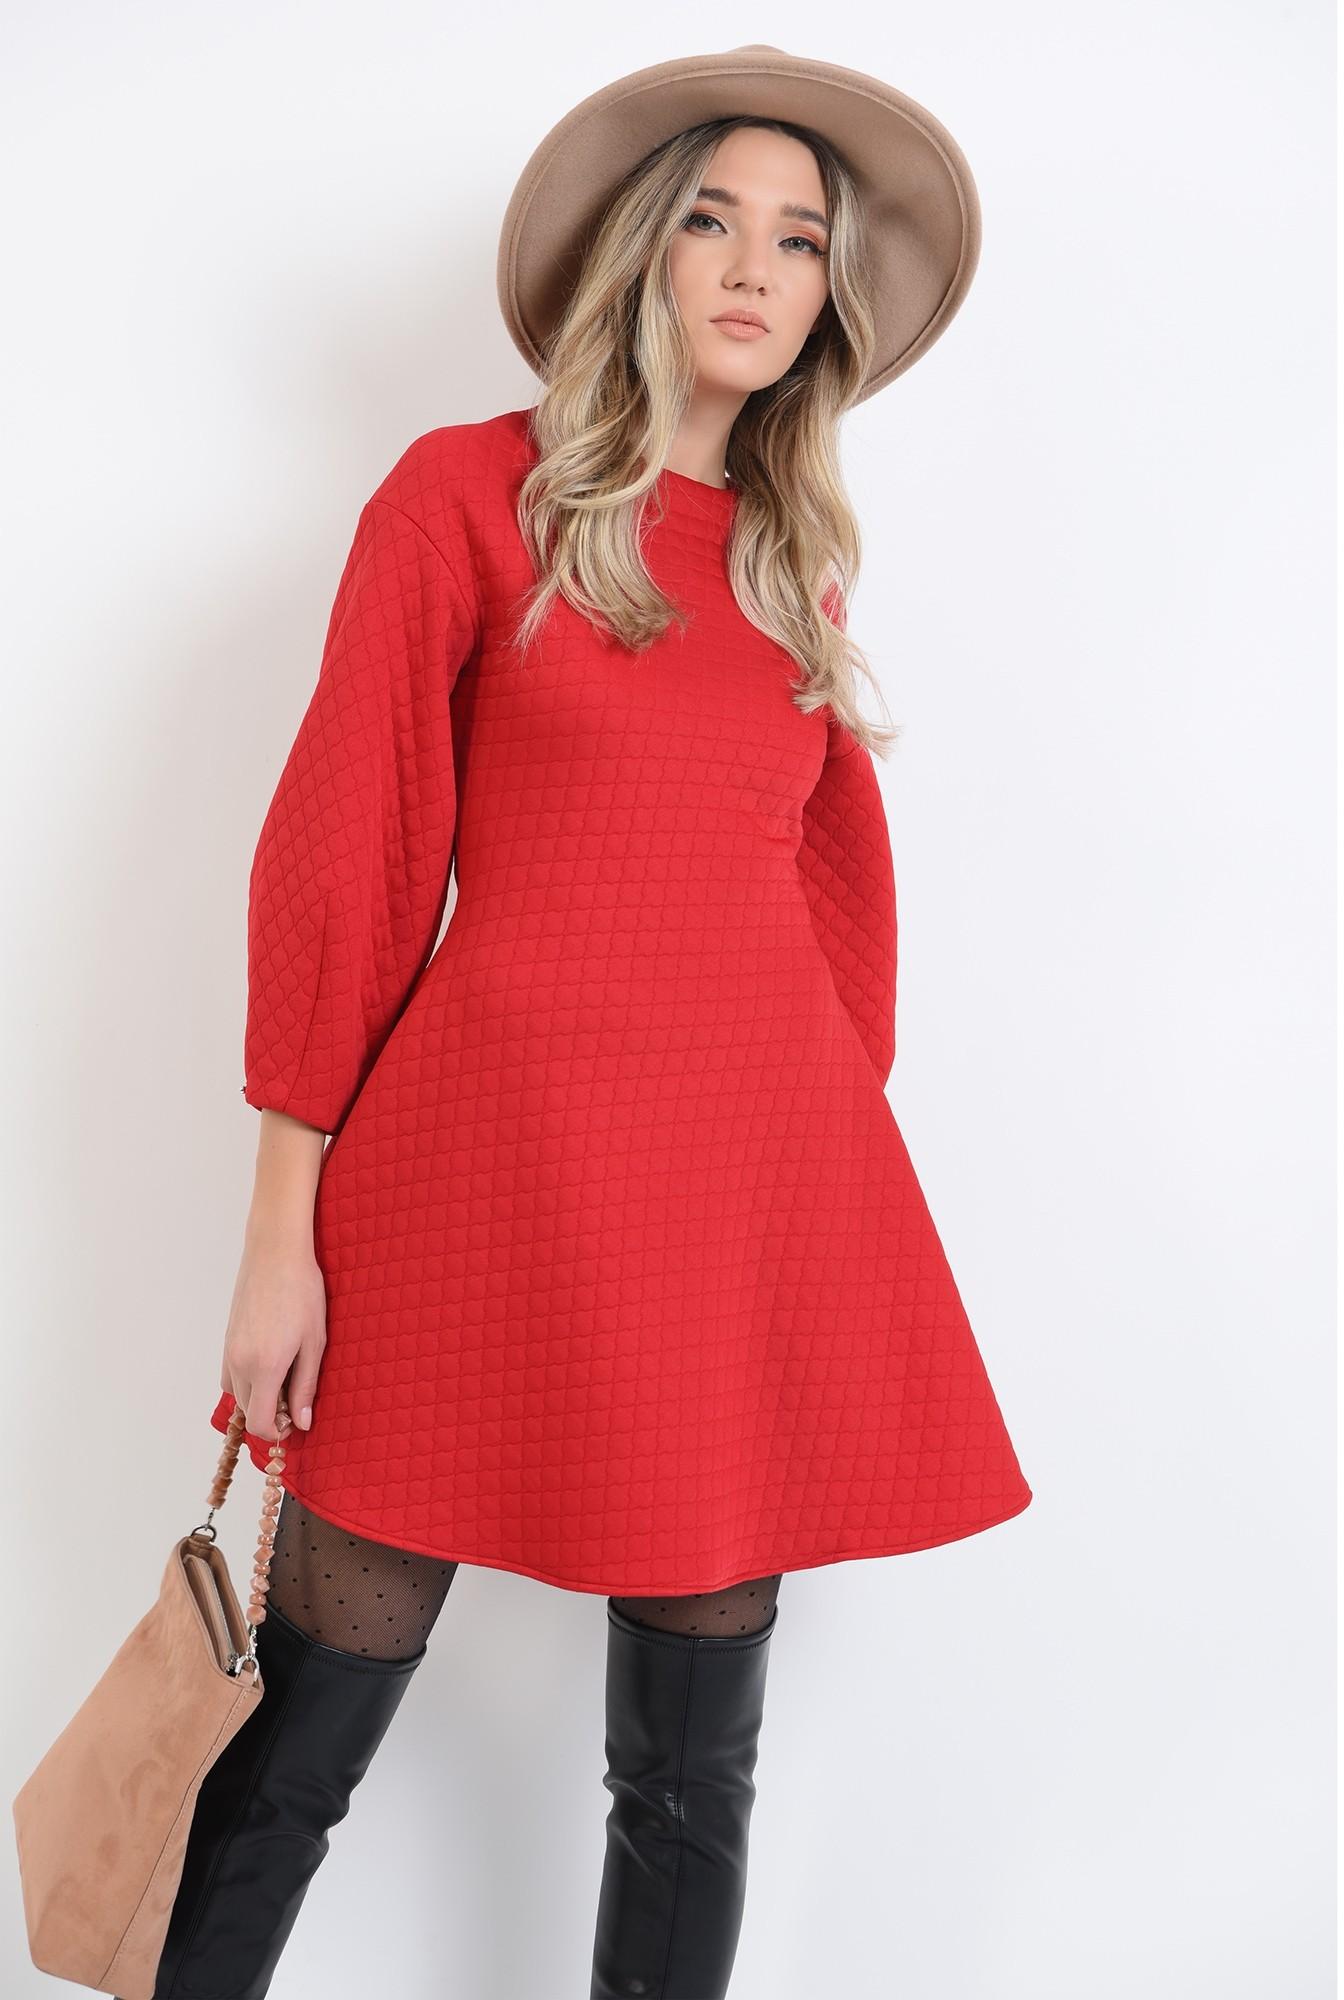 1 - 360 - rochie cu maneci largi, rosie, mini